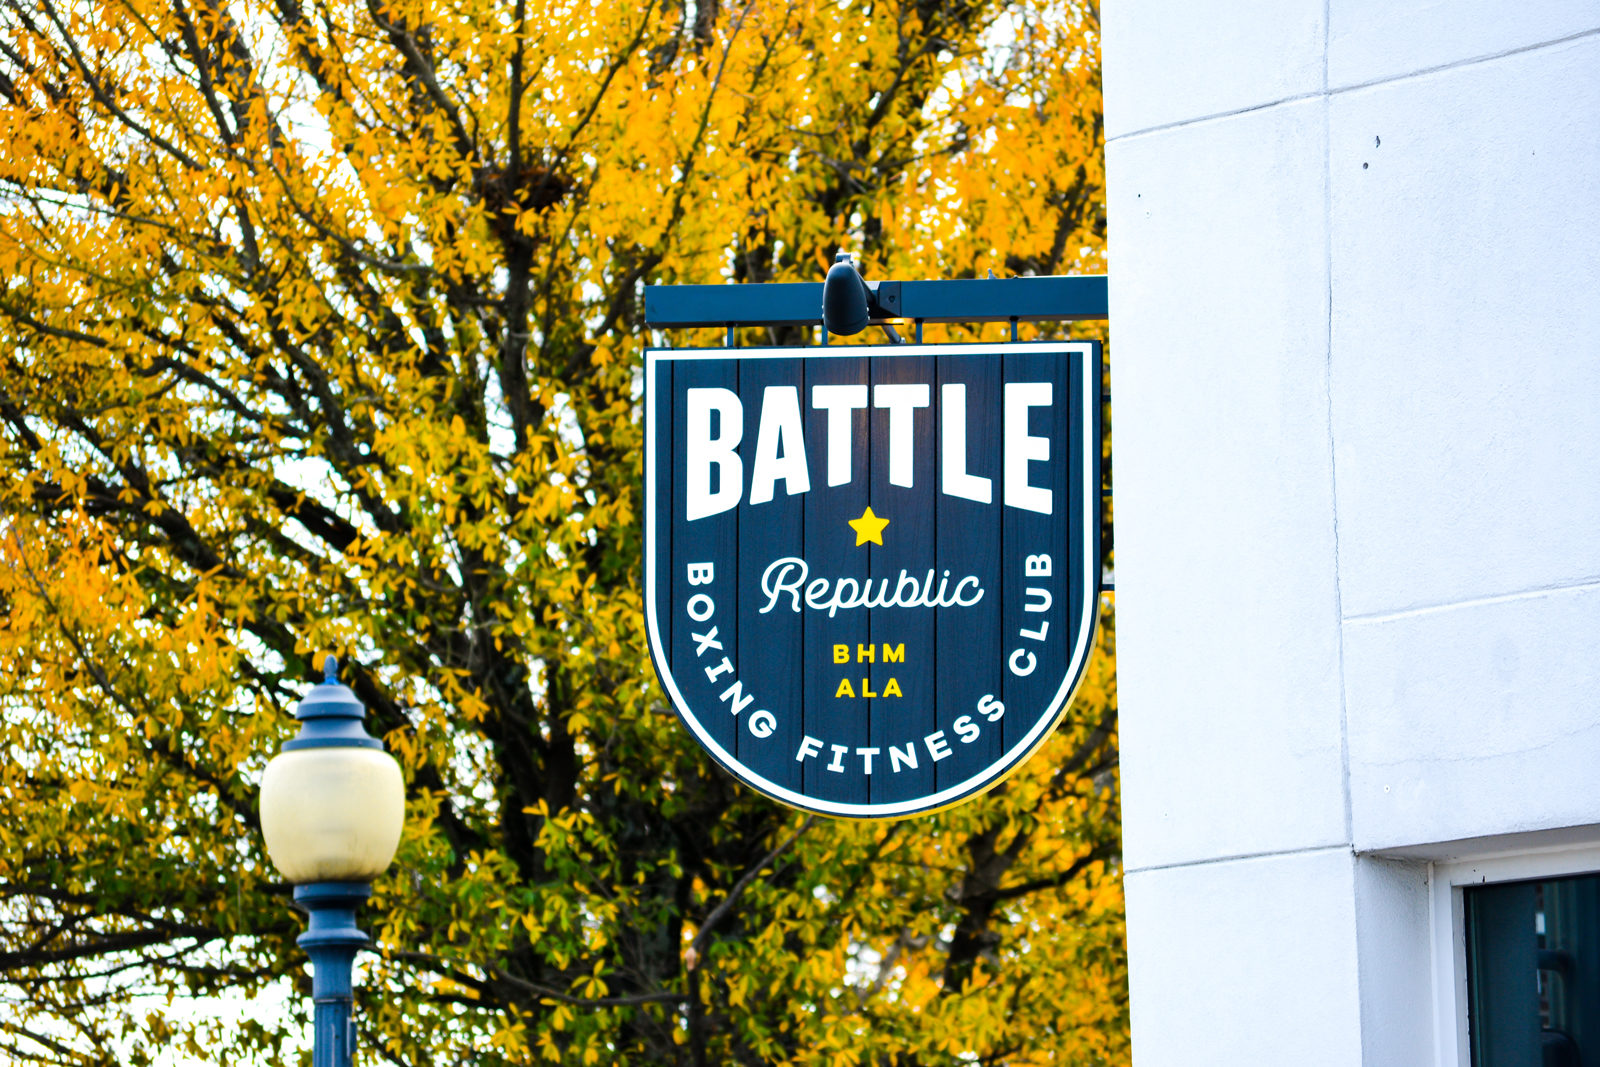 Battle Republic Exterior Flag Sign